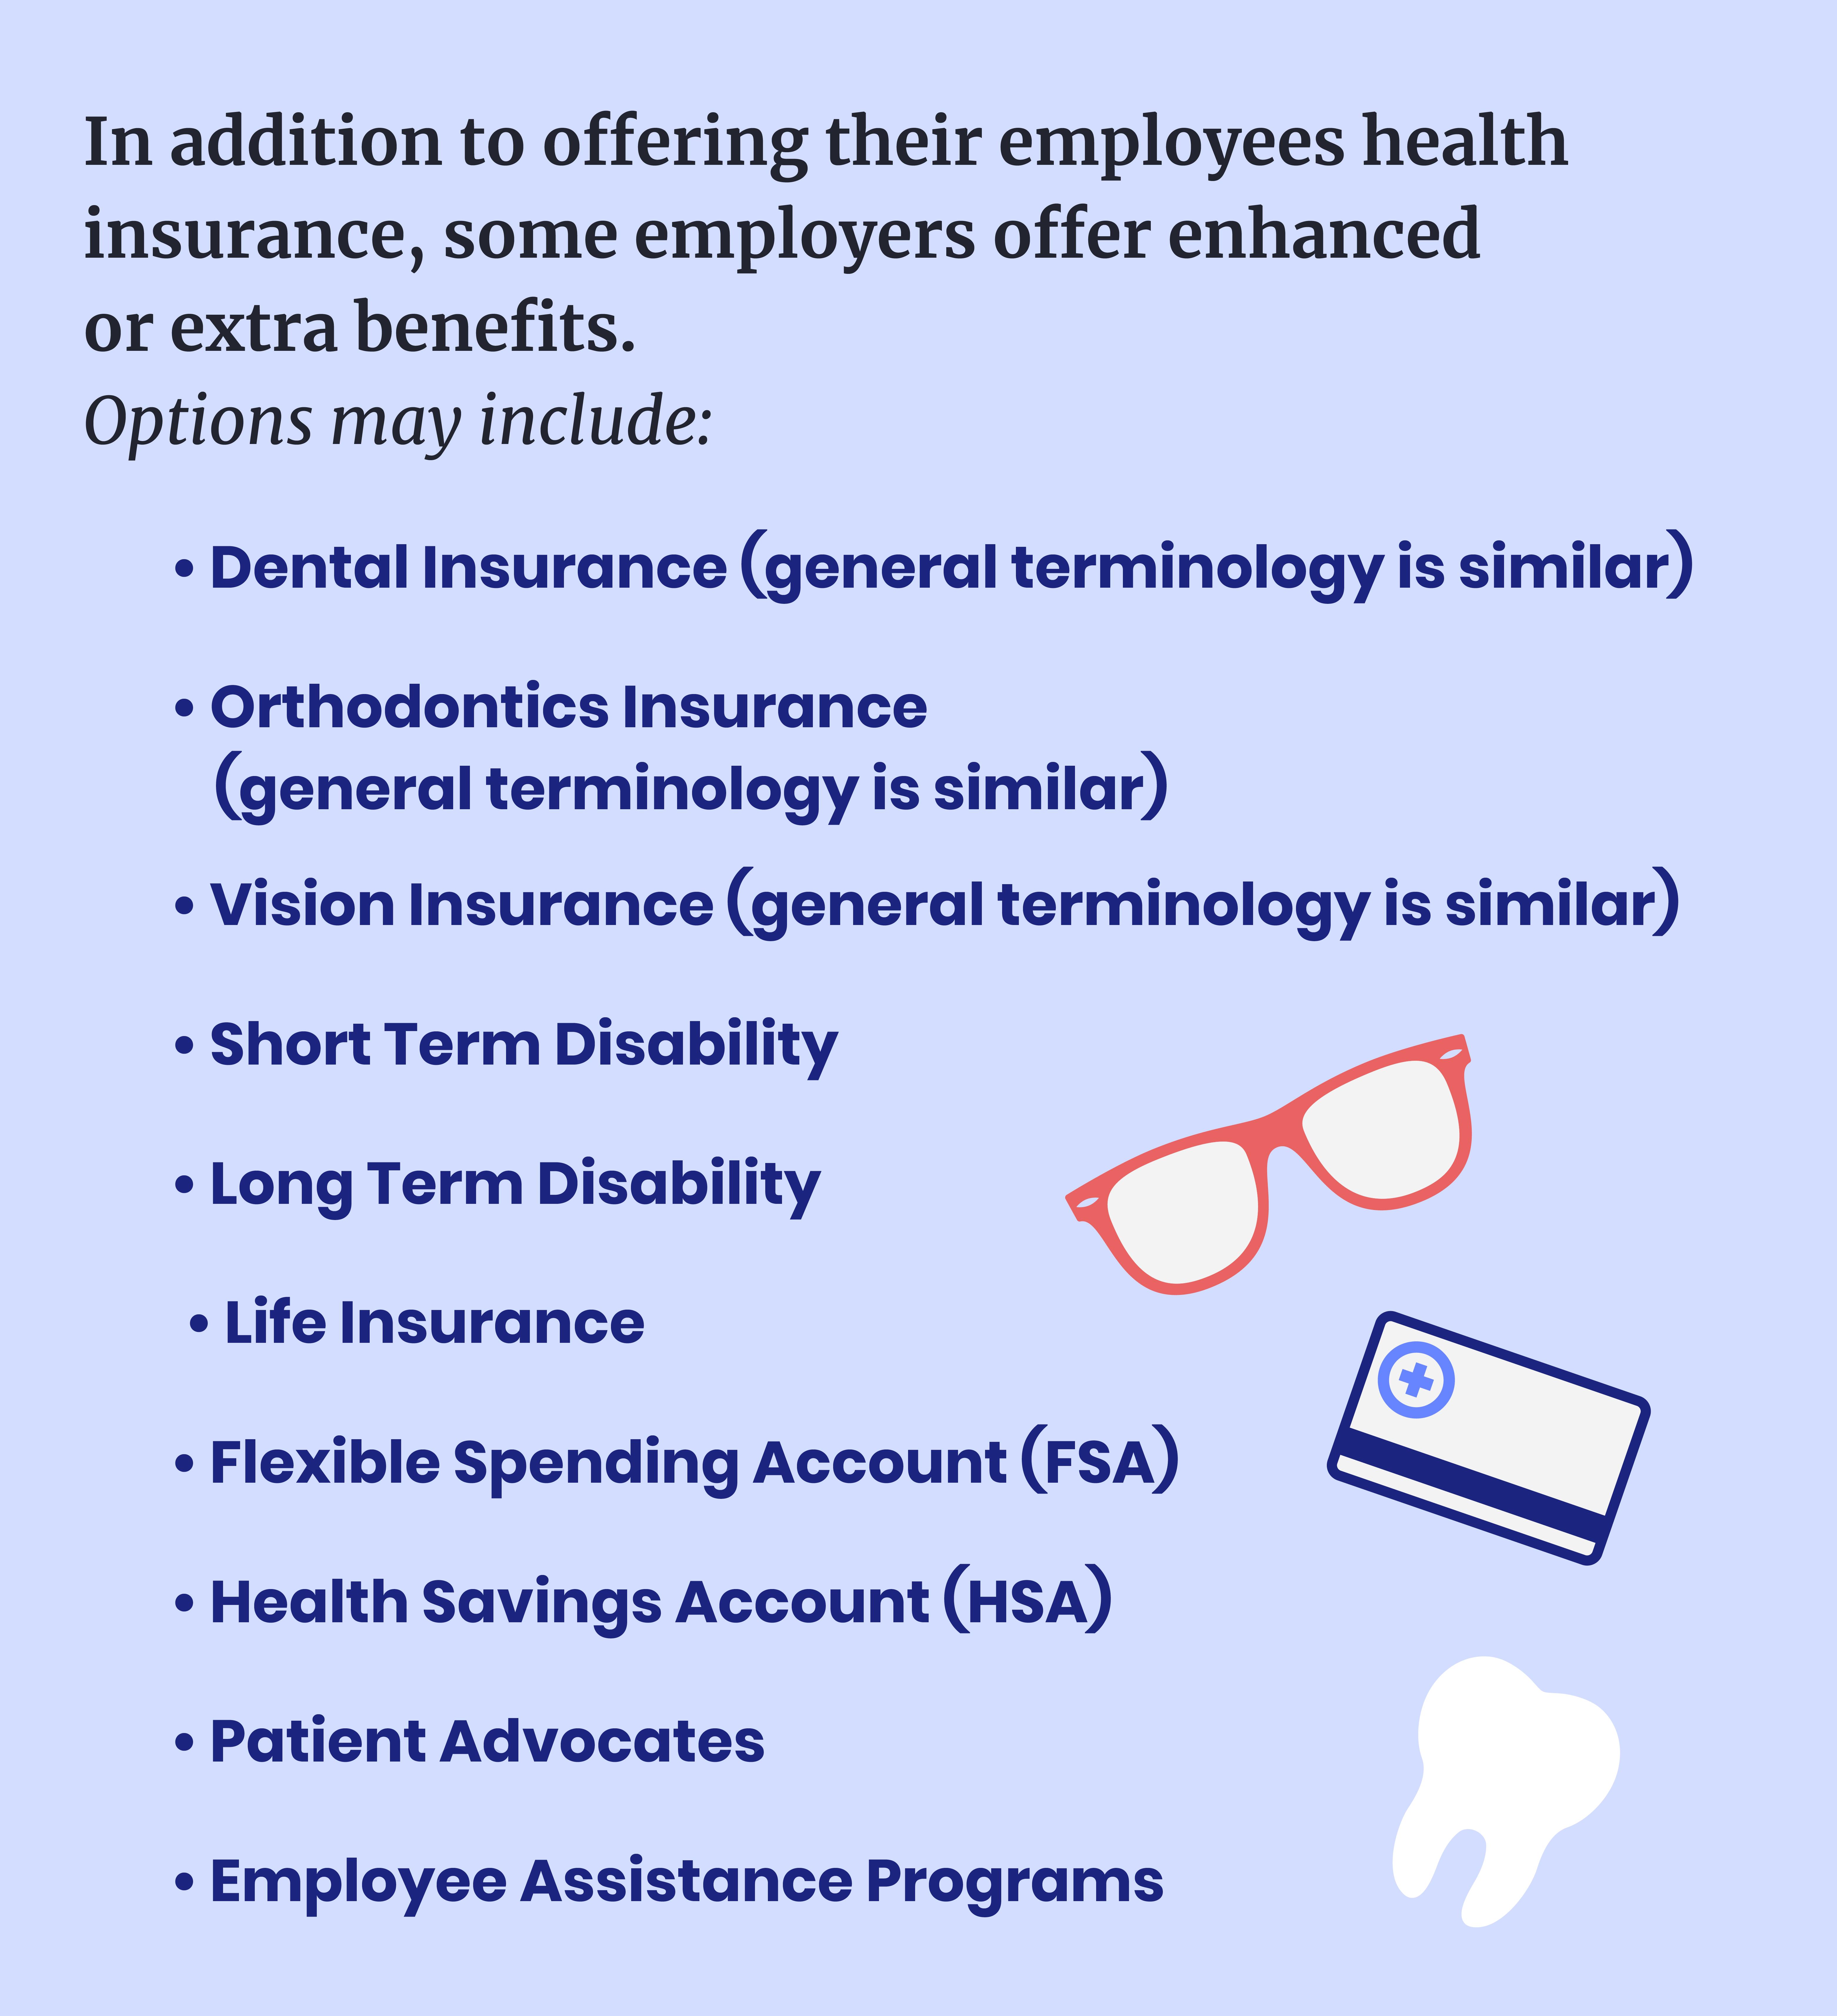 employer enhanced benefits